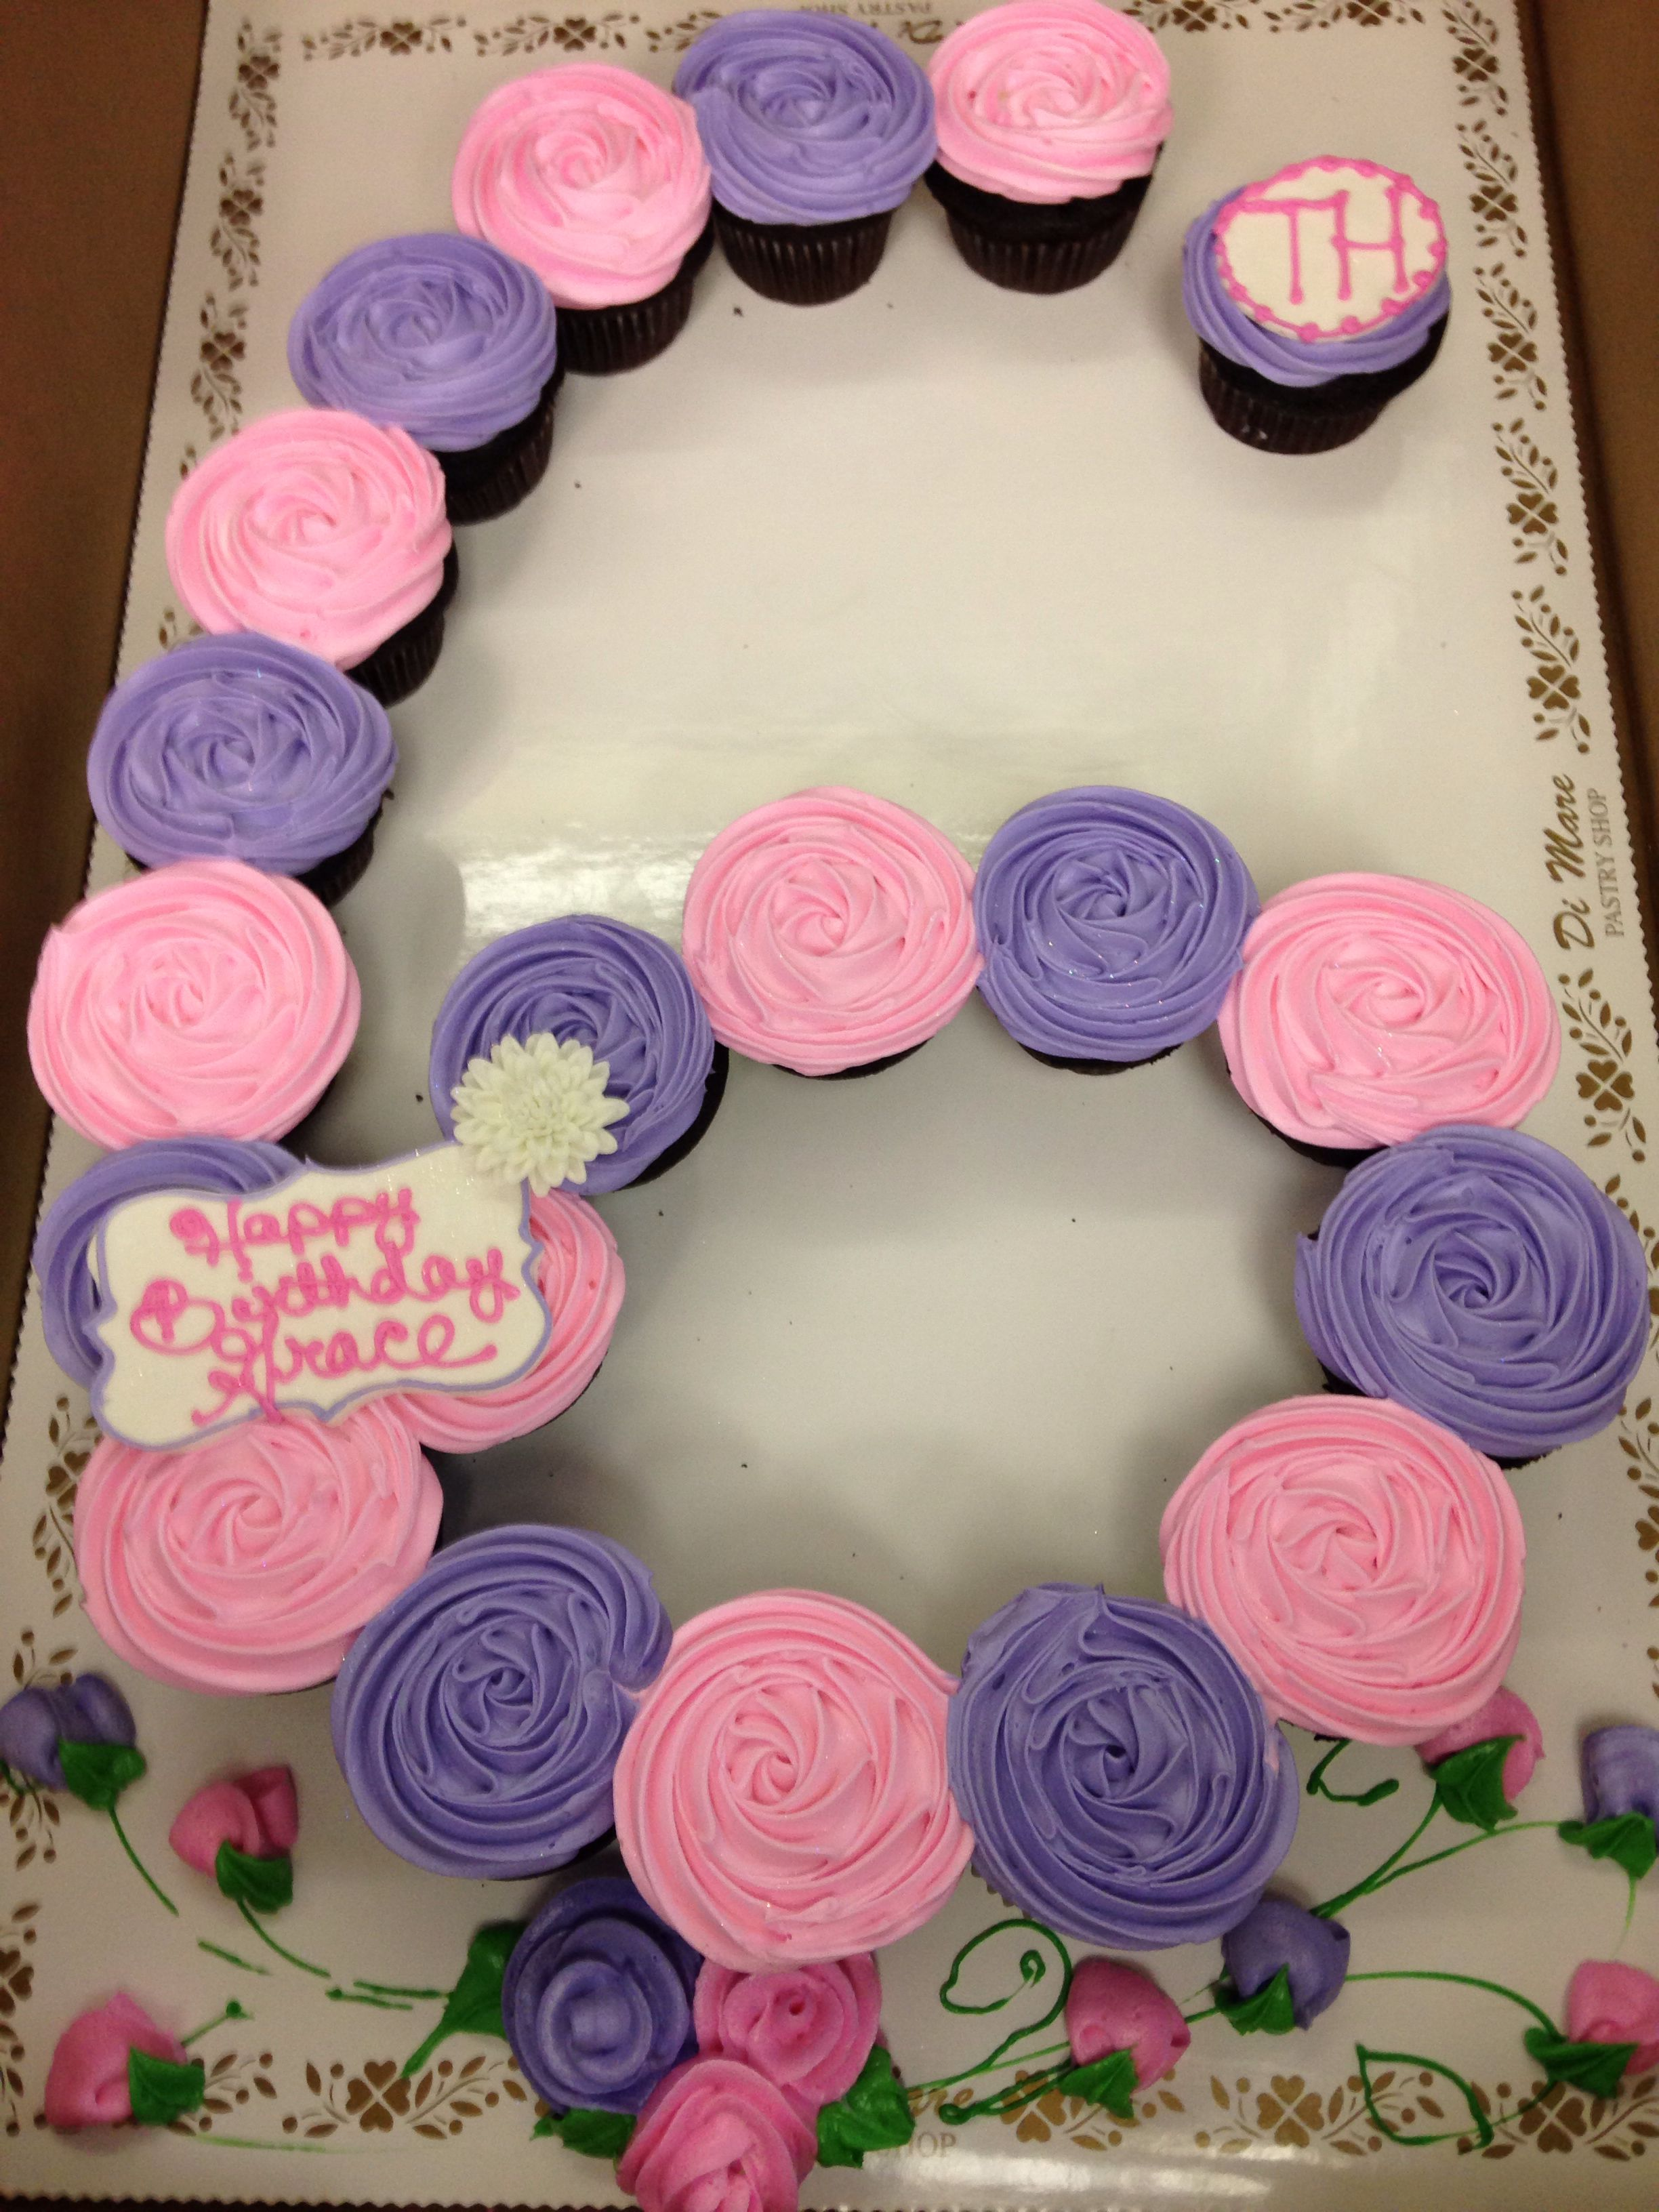 Pink And Lavender Rosette Number 6 Cupcake Cake Enjoy Decorating